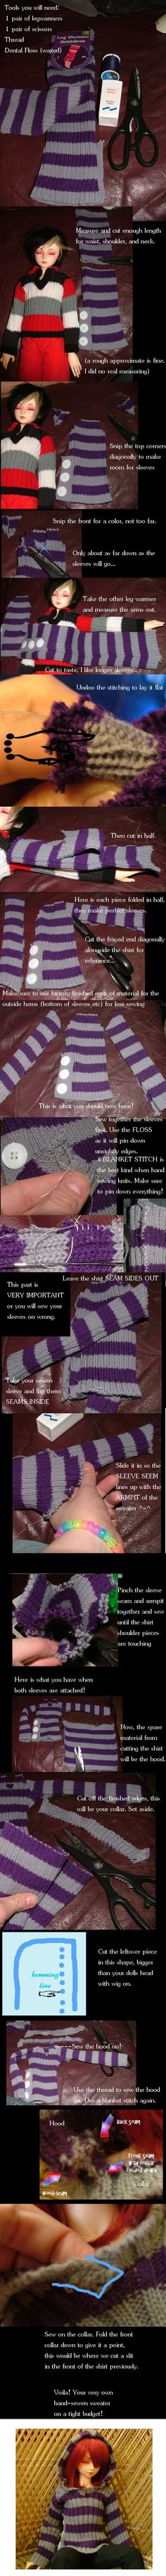 Make a BJD Sweater our of Legwarmers! by darkawaii on deviantART